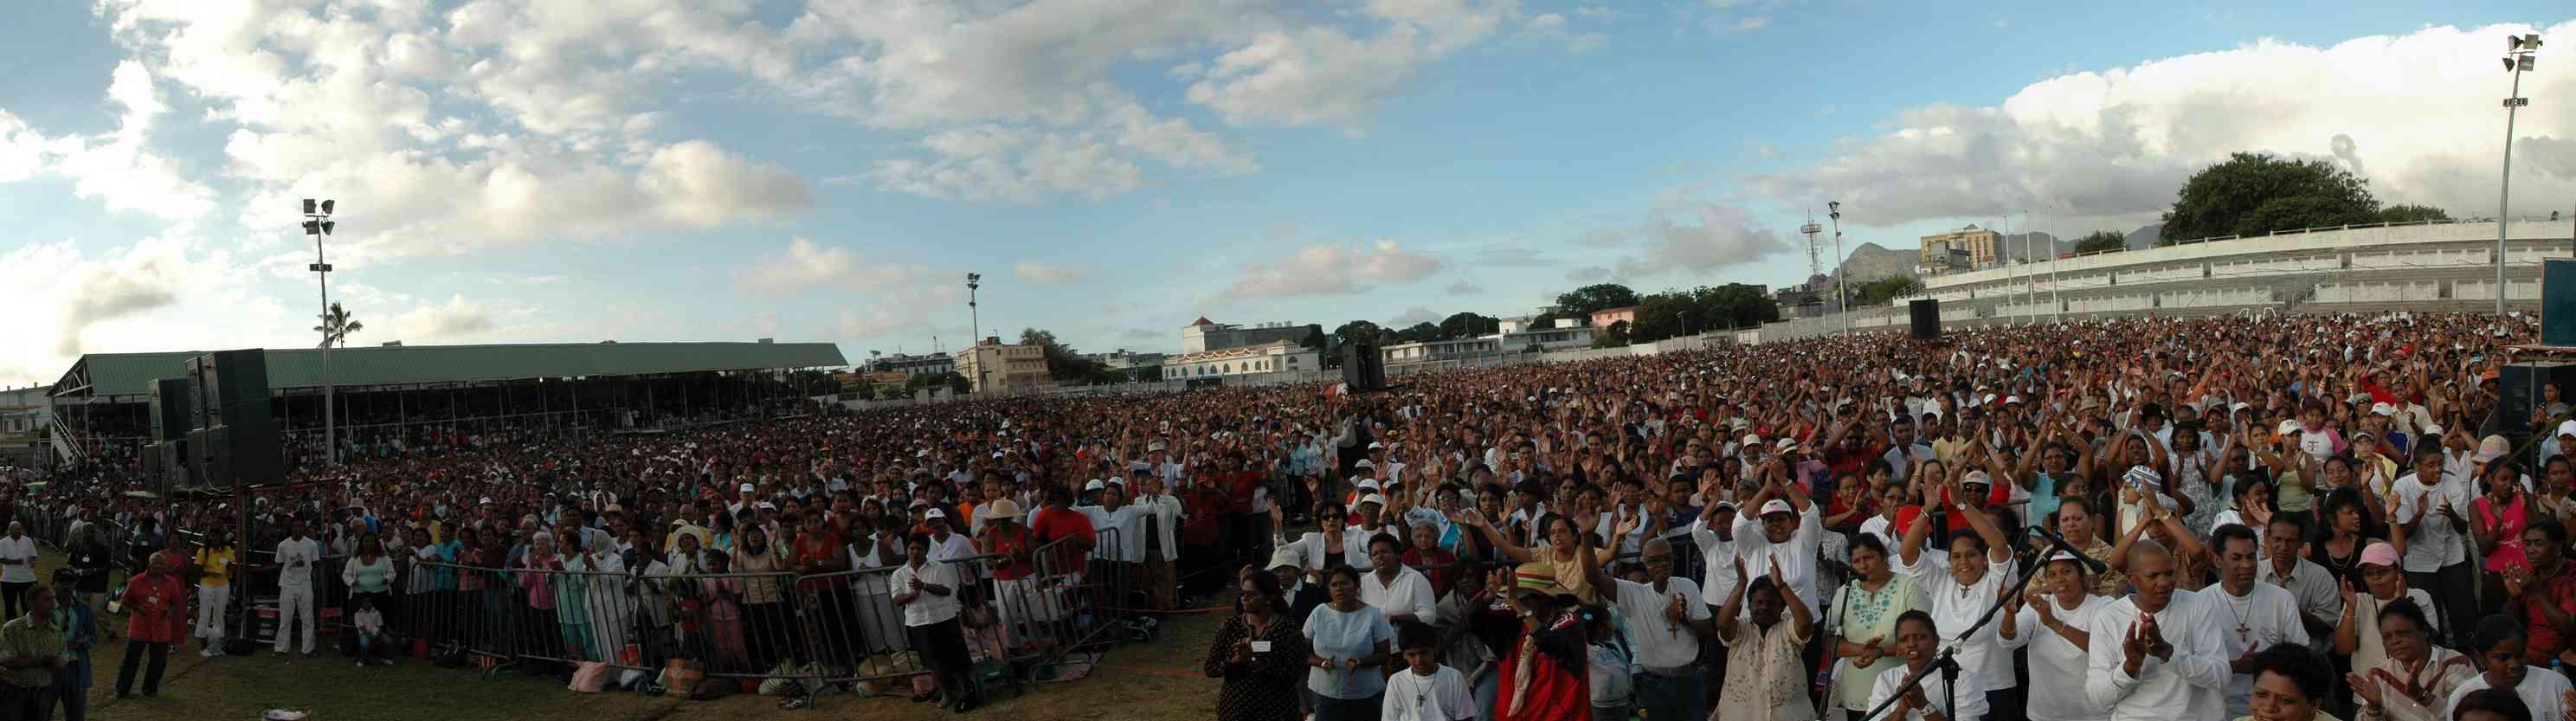 06 >> Rose Hill Stadium - Mauritius. November 10 - 12. 2006